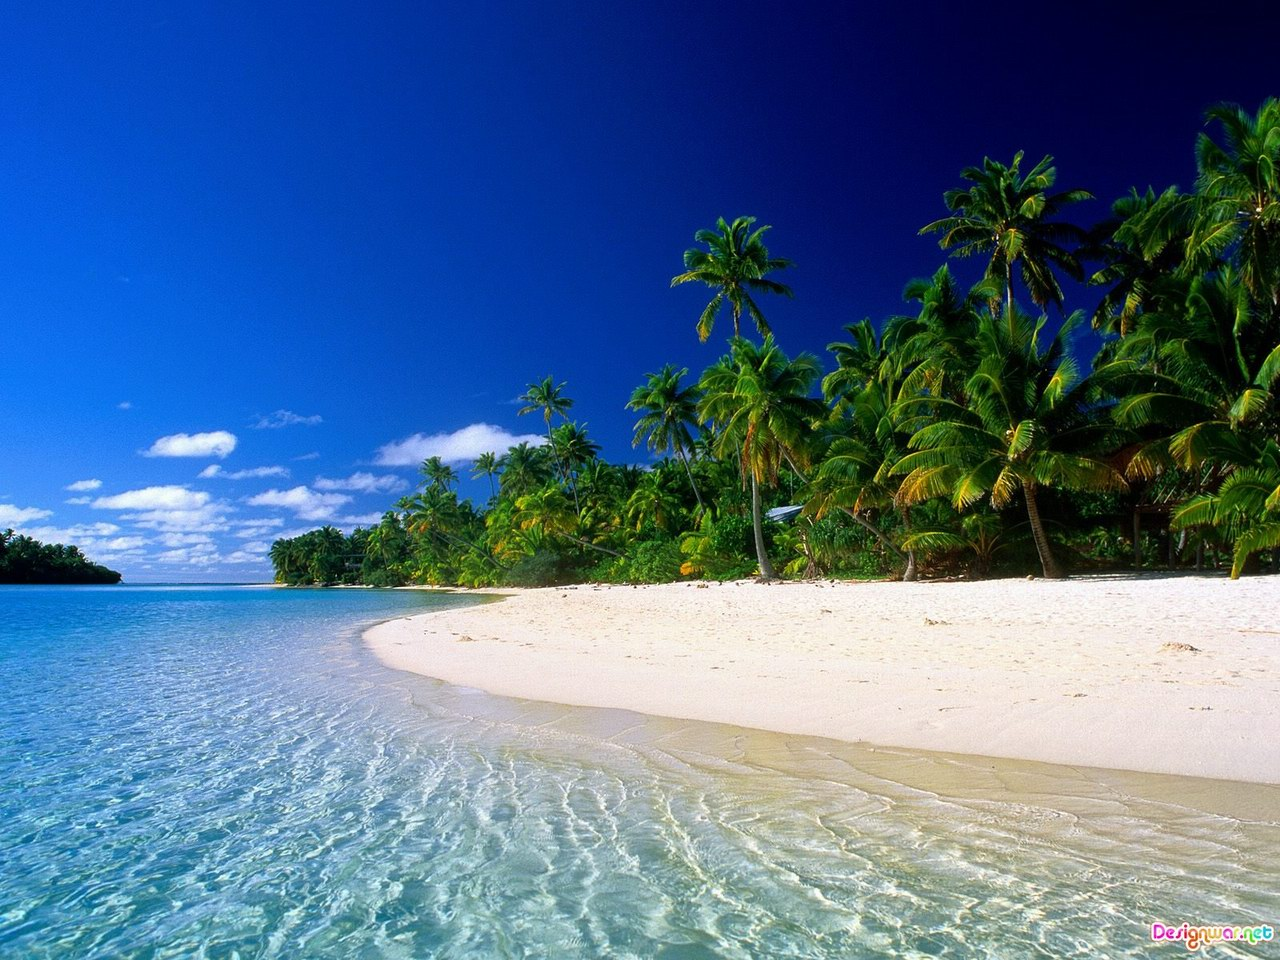 Tropical Beach hd Wallpaper High Quality WallpapersWallpaper 1280x960